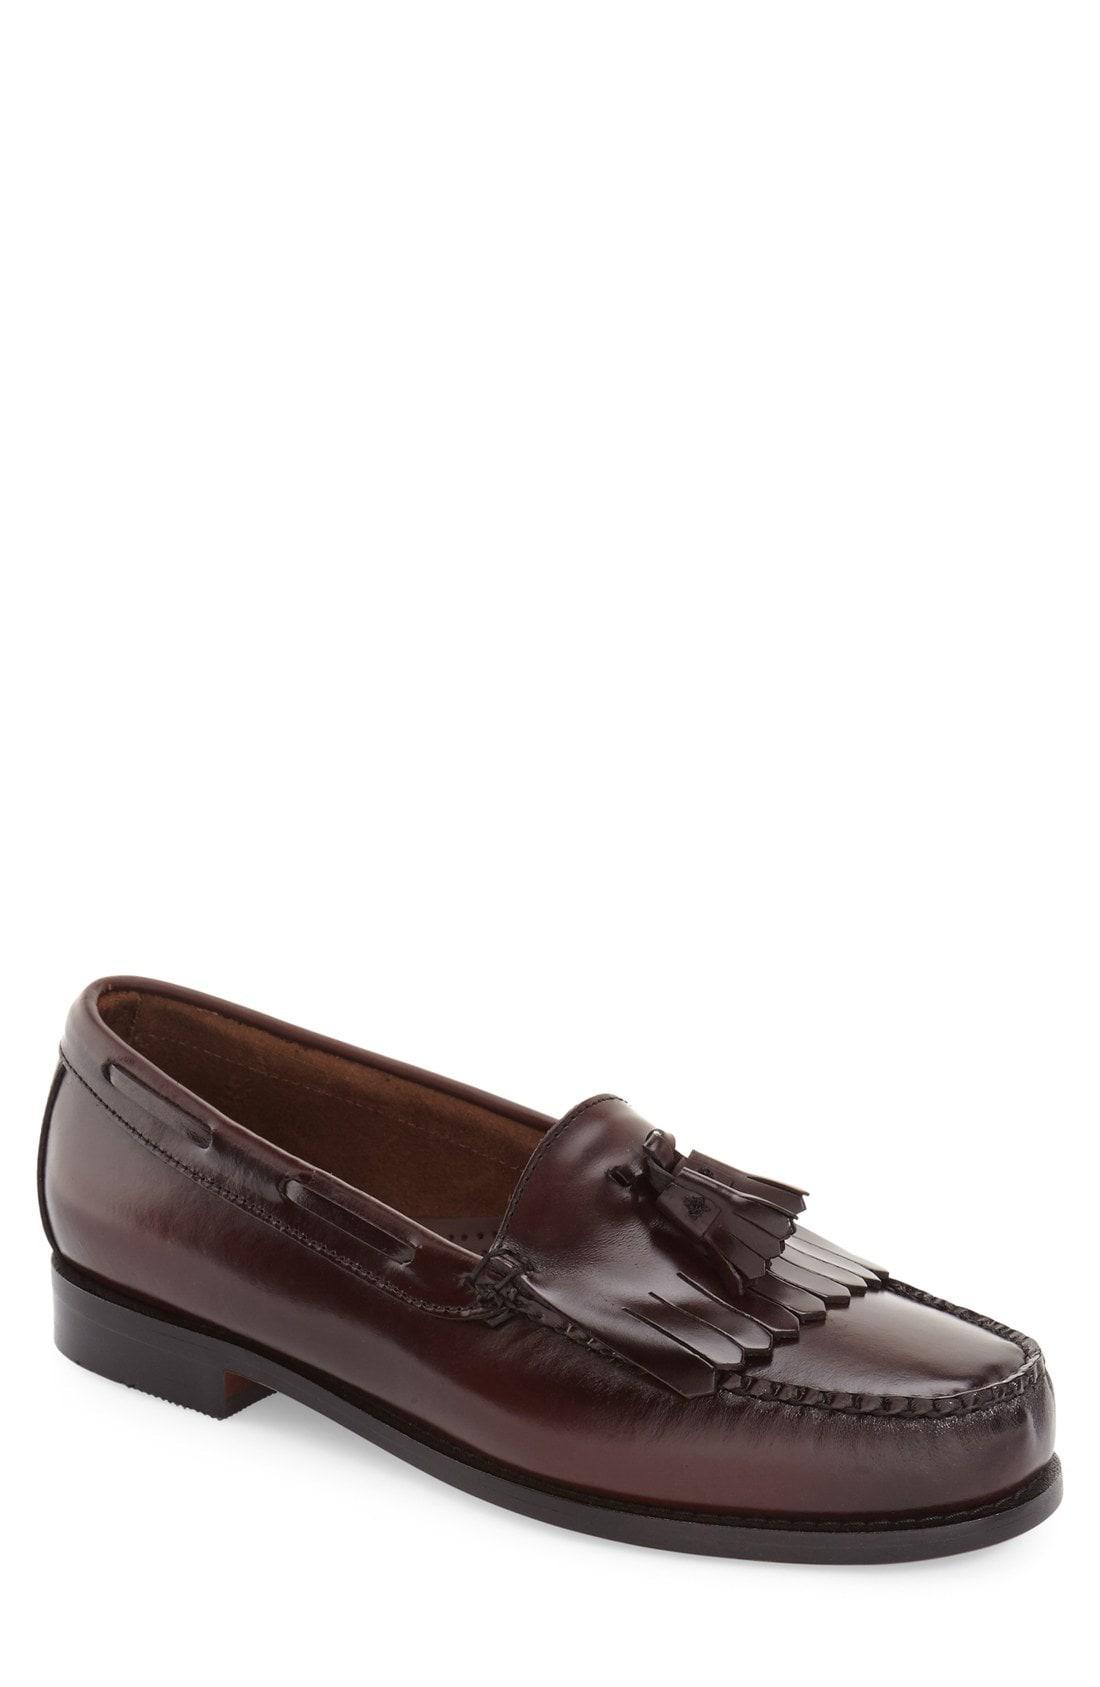 25d2641b70b Lyst - G.H.Bass  layton  Tassel Loafer in Brown for Men